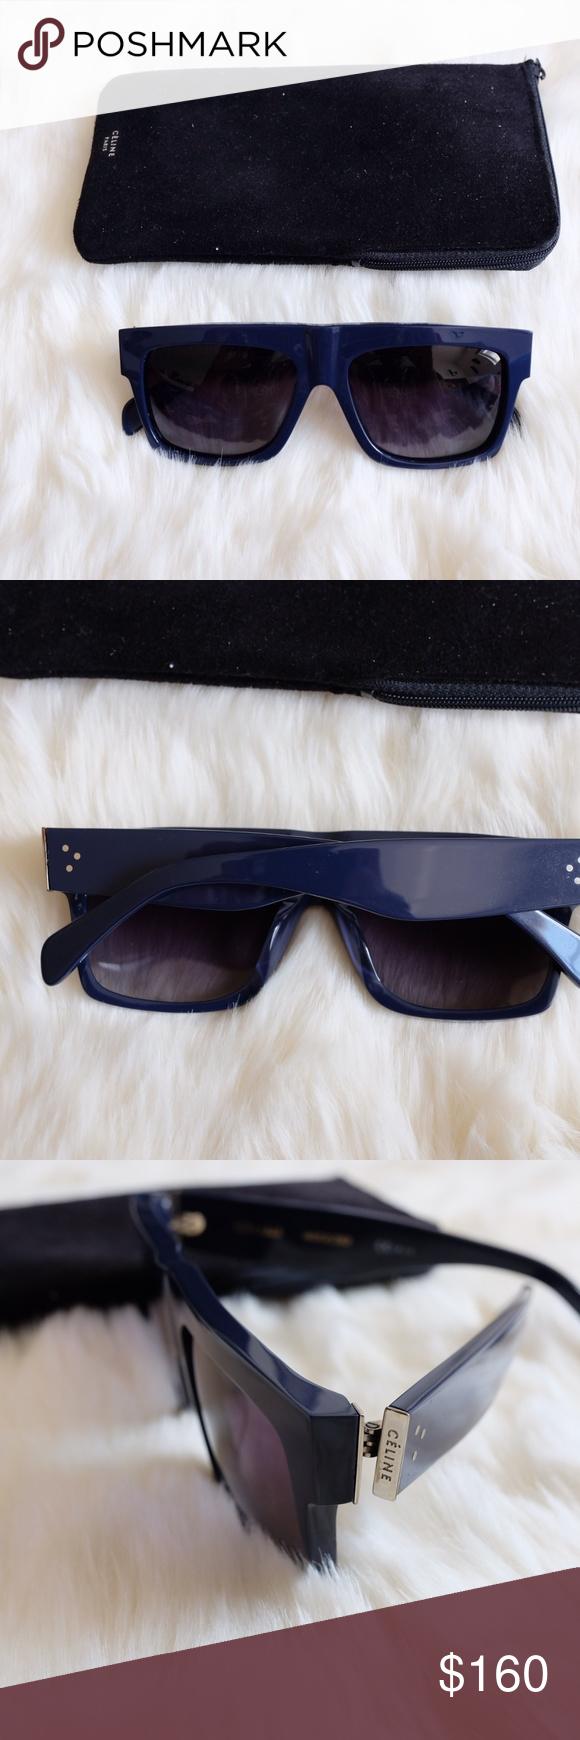 e4c12fad457 Celine ZZ Flat Top Polarized Navy Blue Sunglasses Retail   --